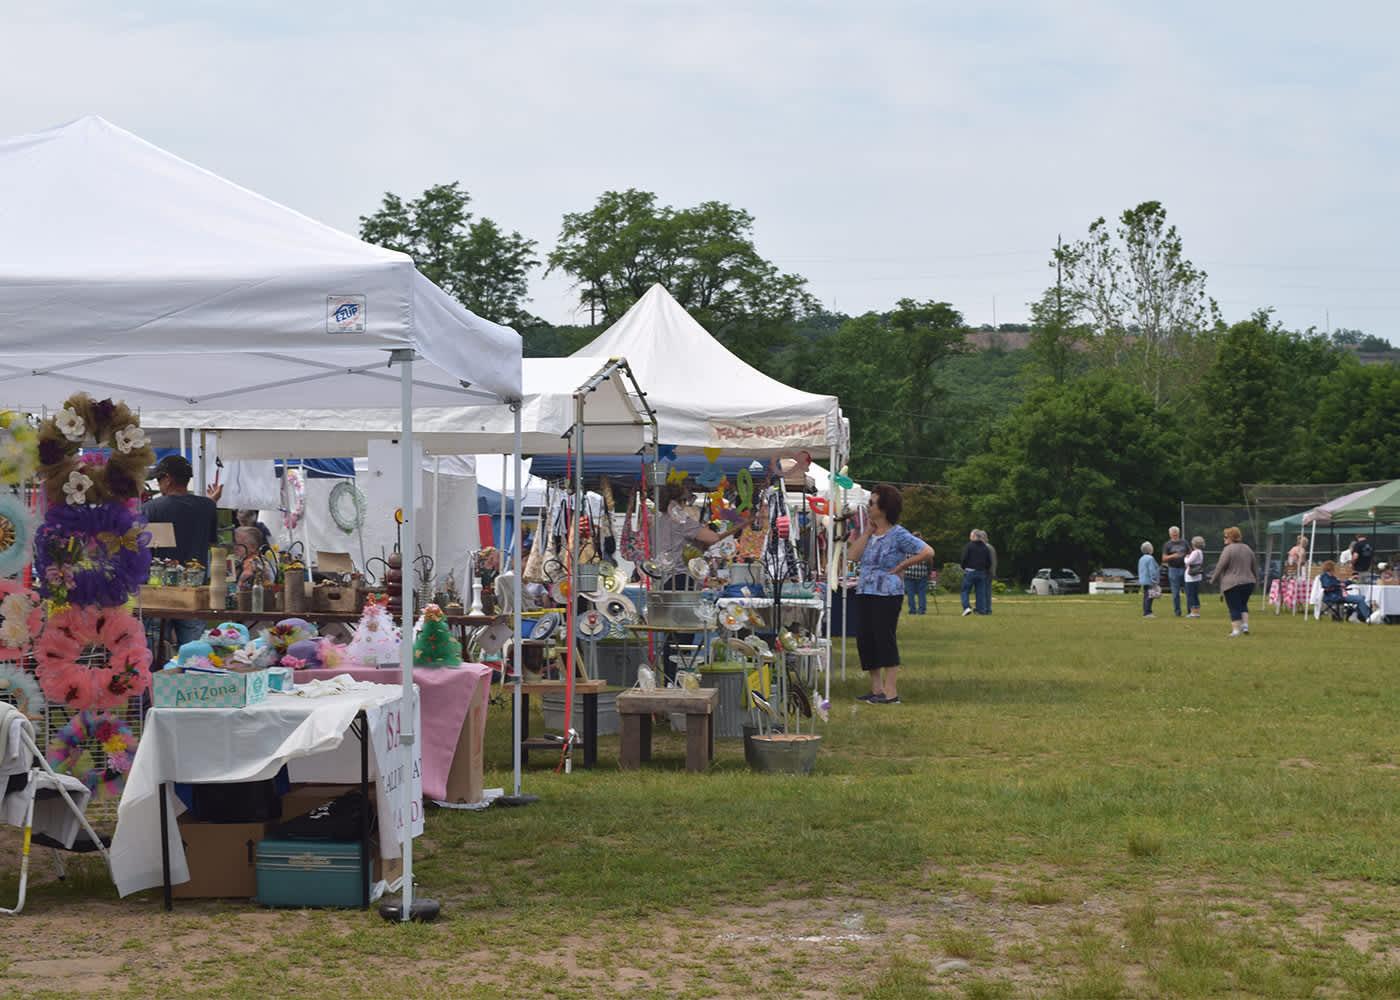 Arts & Crafts Fair in Bingham Park | Hawley, PA 18428